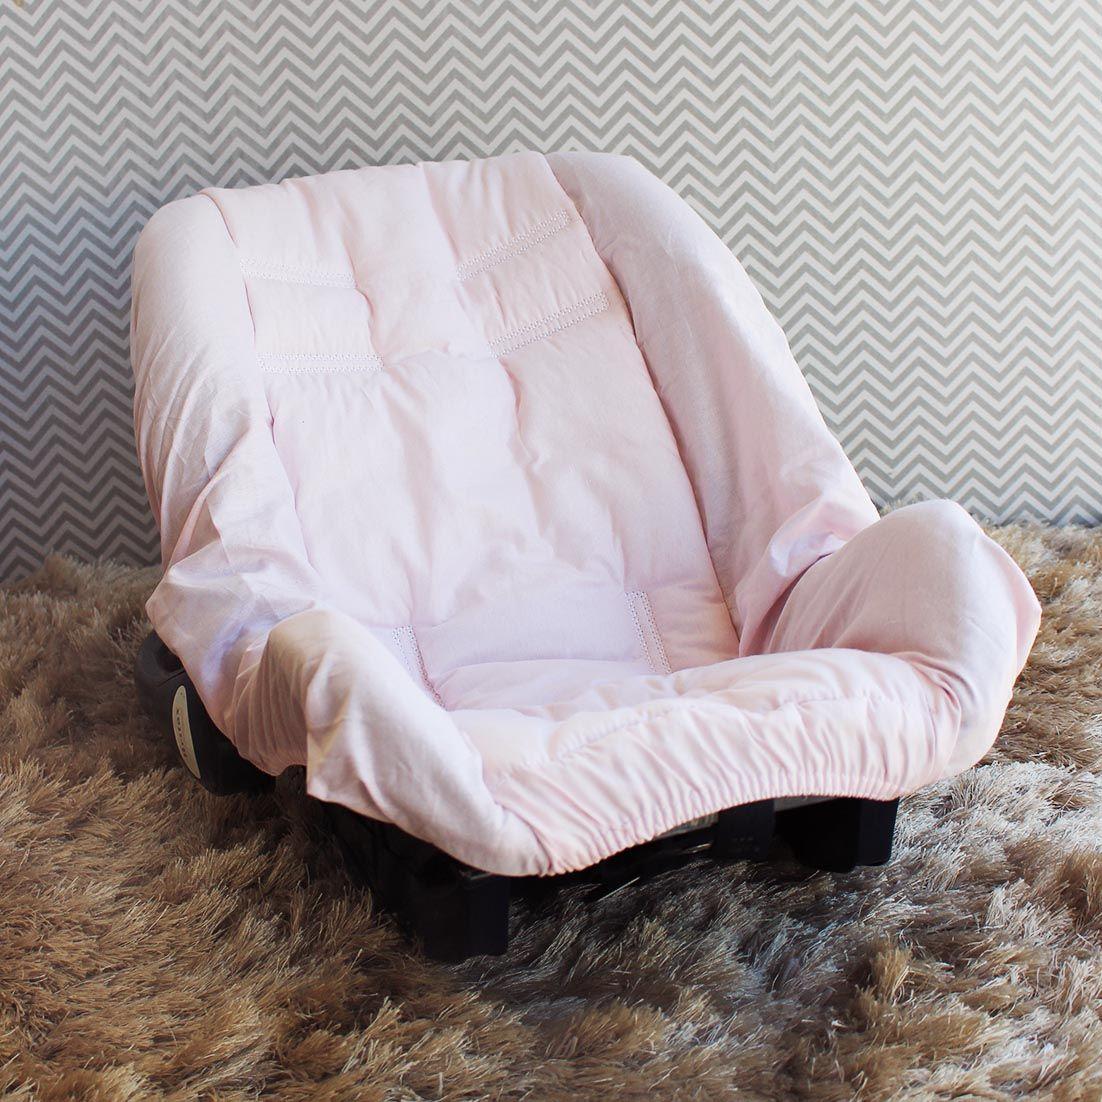 Capa de Bebê Conforto Adapt - Rosa c/ Branco